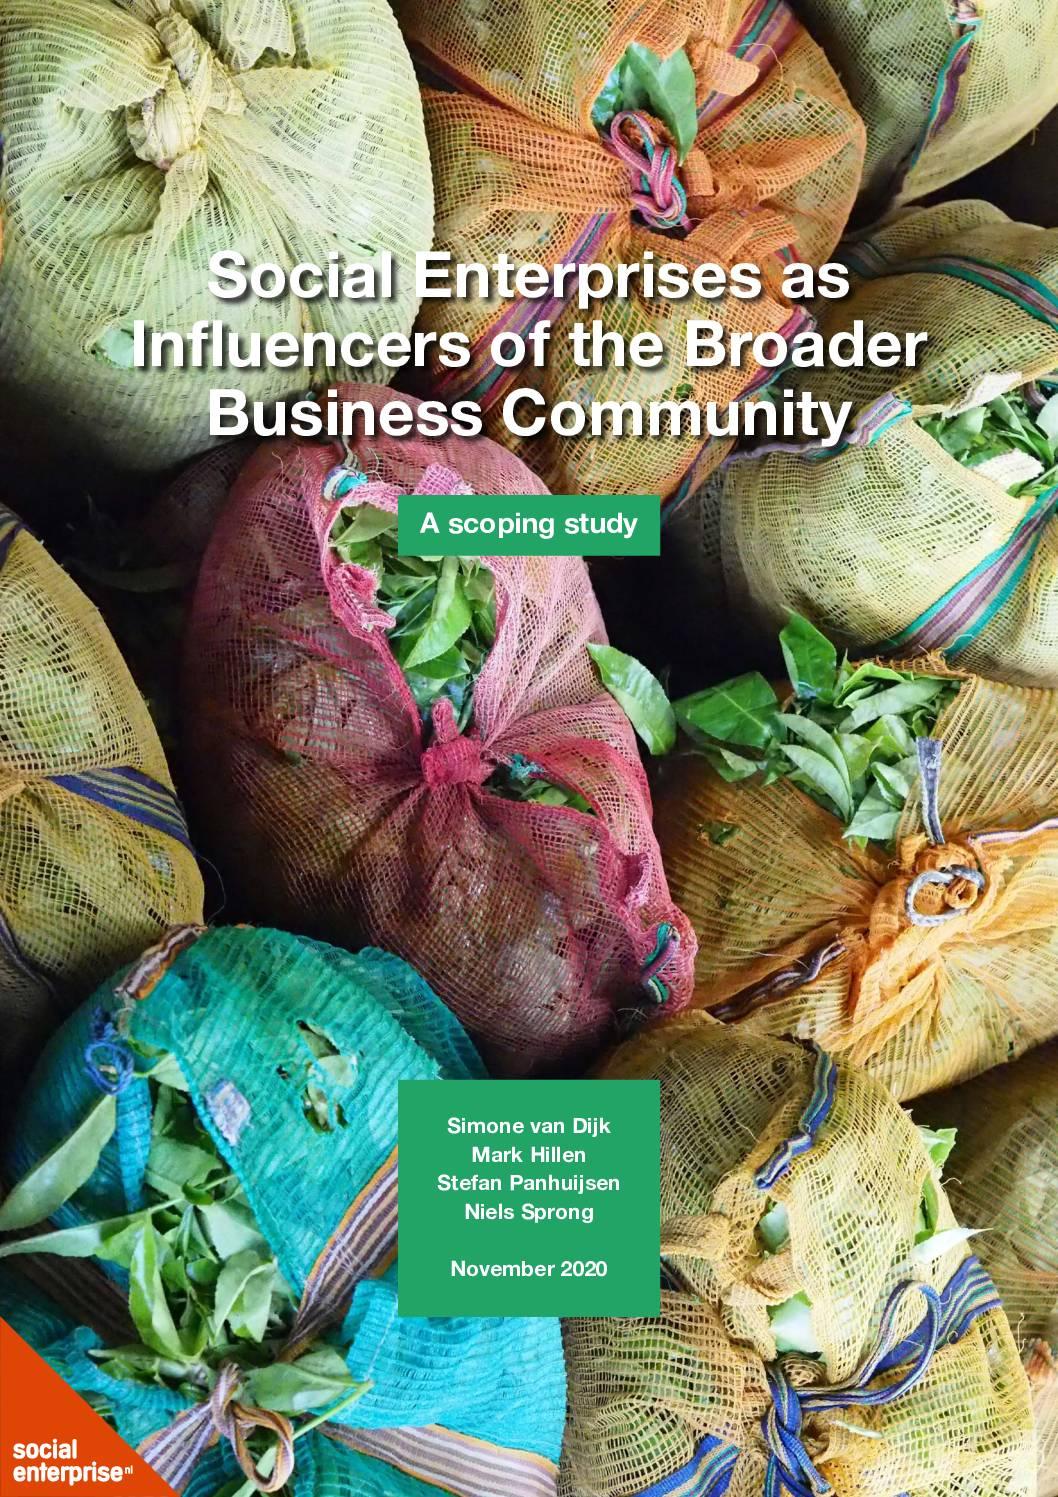 Social Enterprises as Influencers of the Broader Business Community